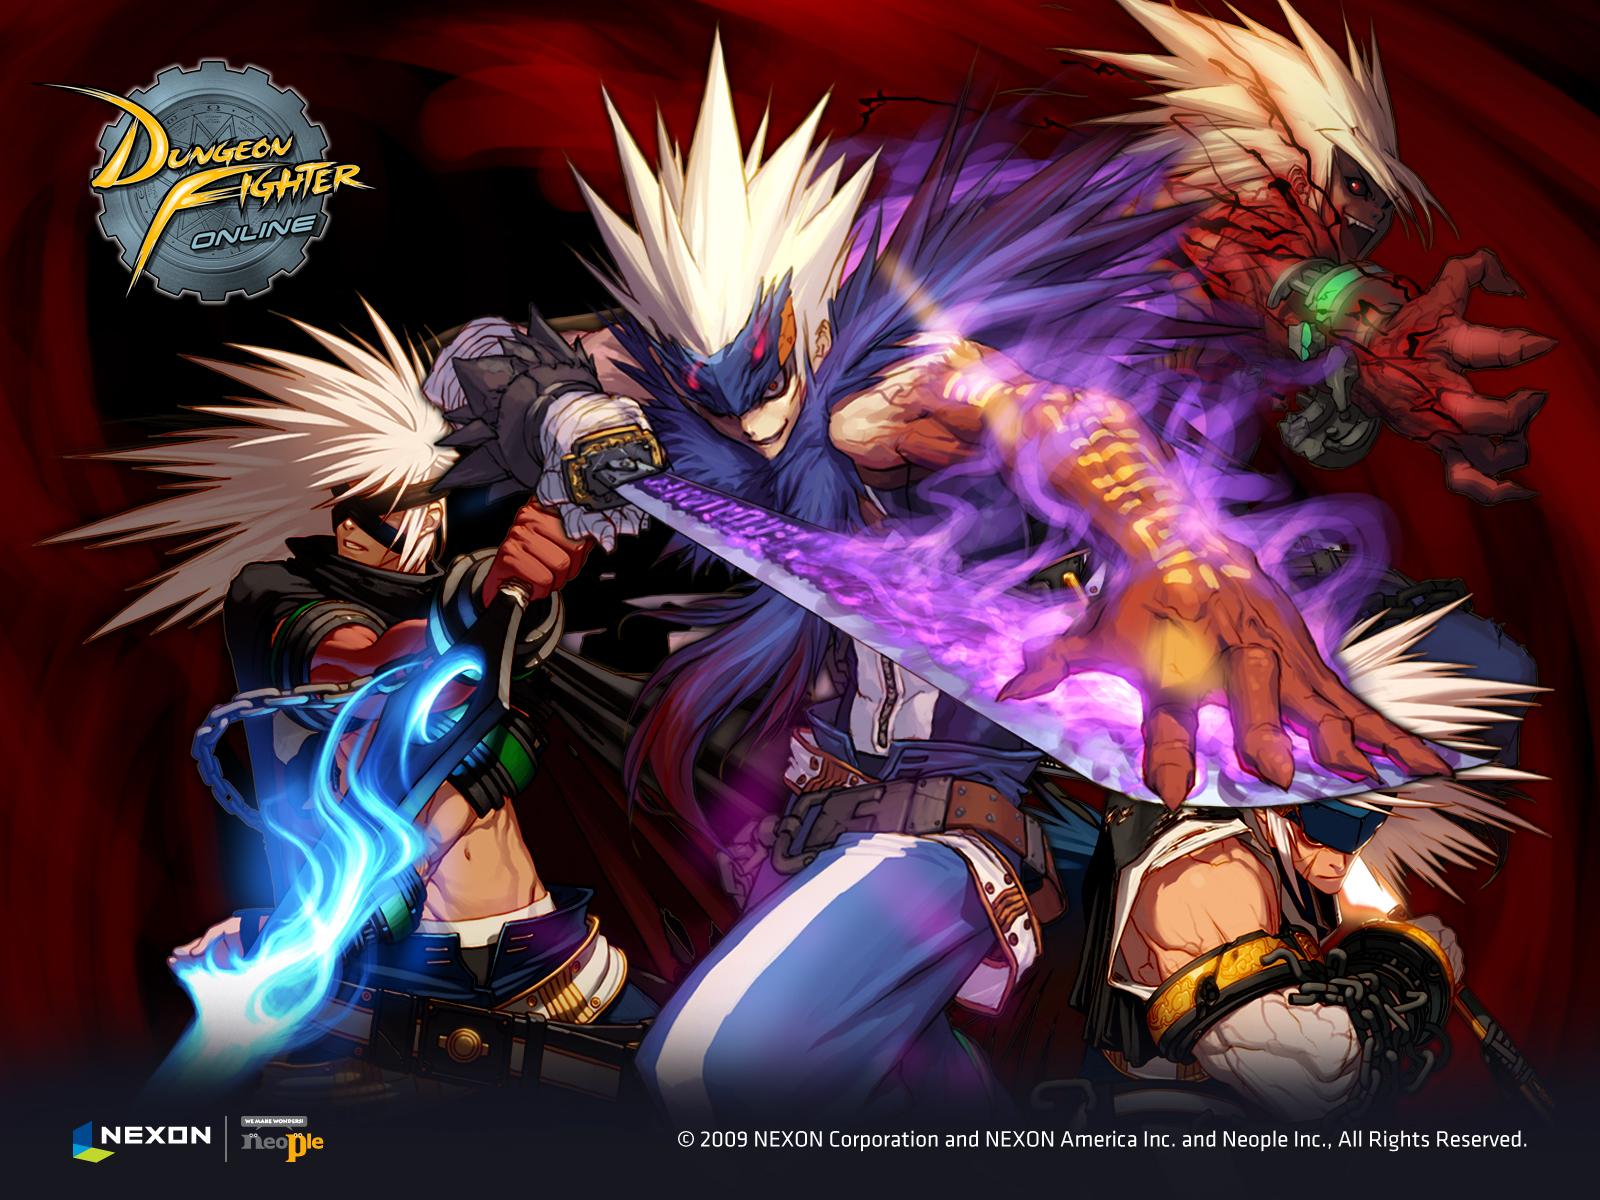 Wallpaper del videojuego Dungeon Fighter Online 1600x1200